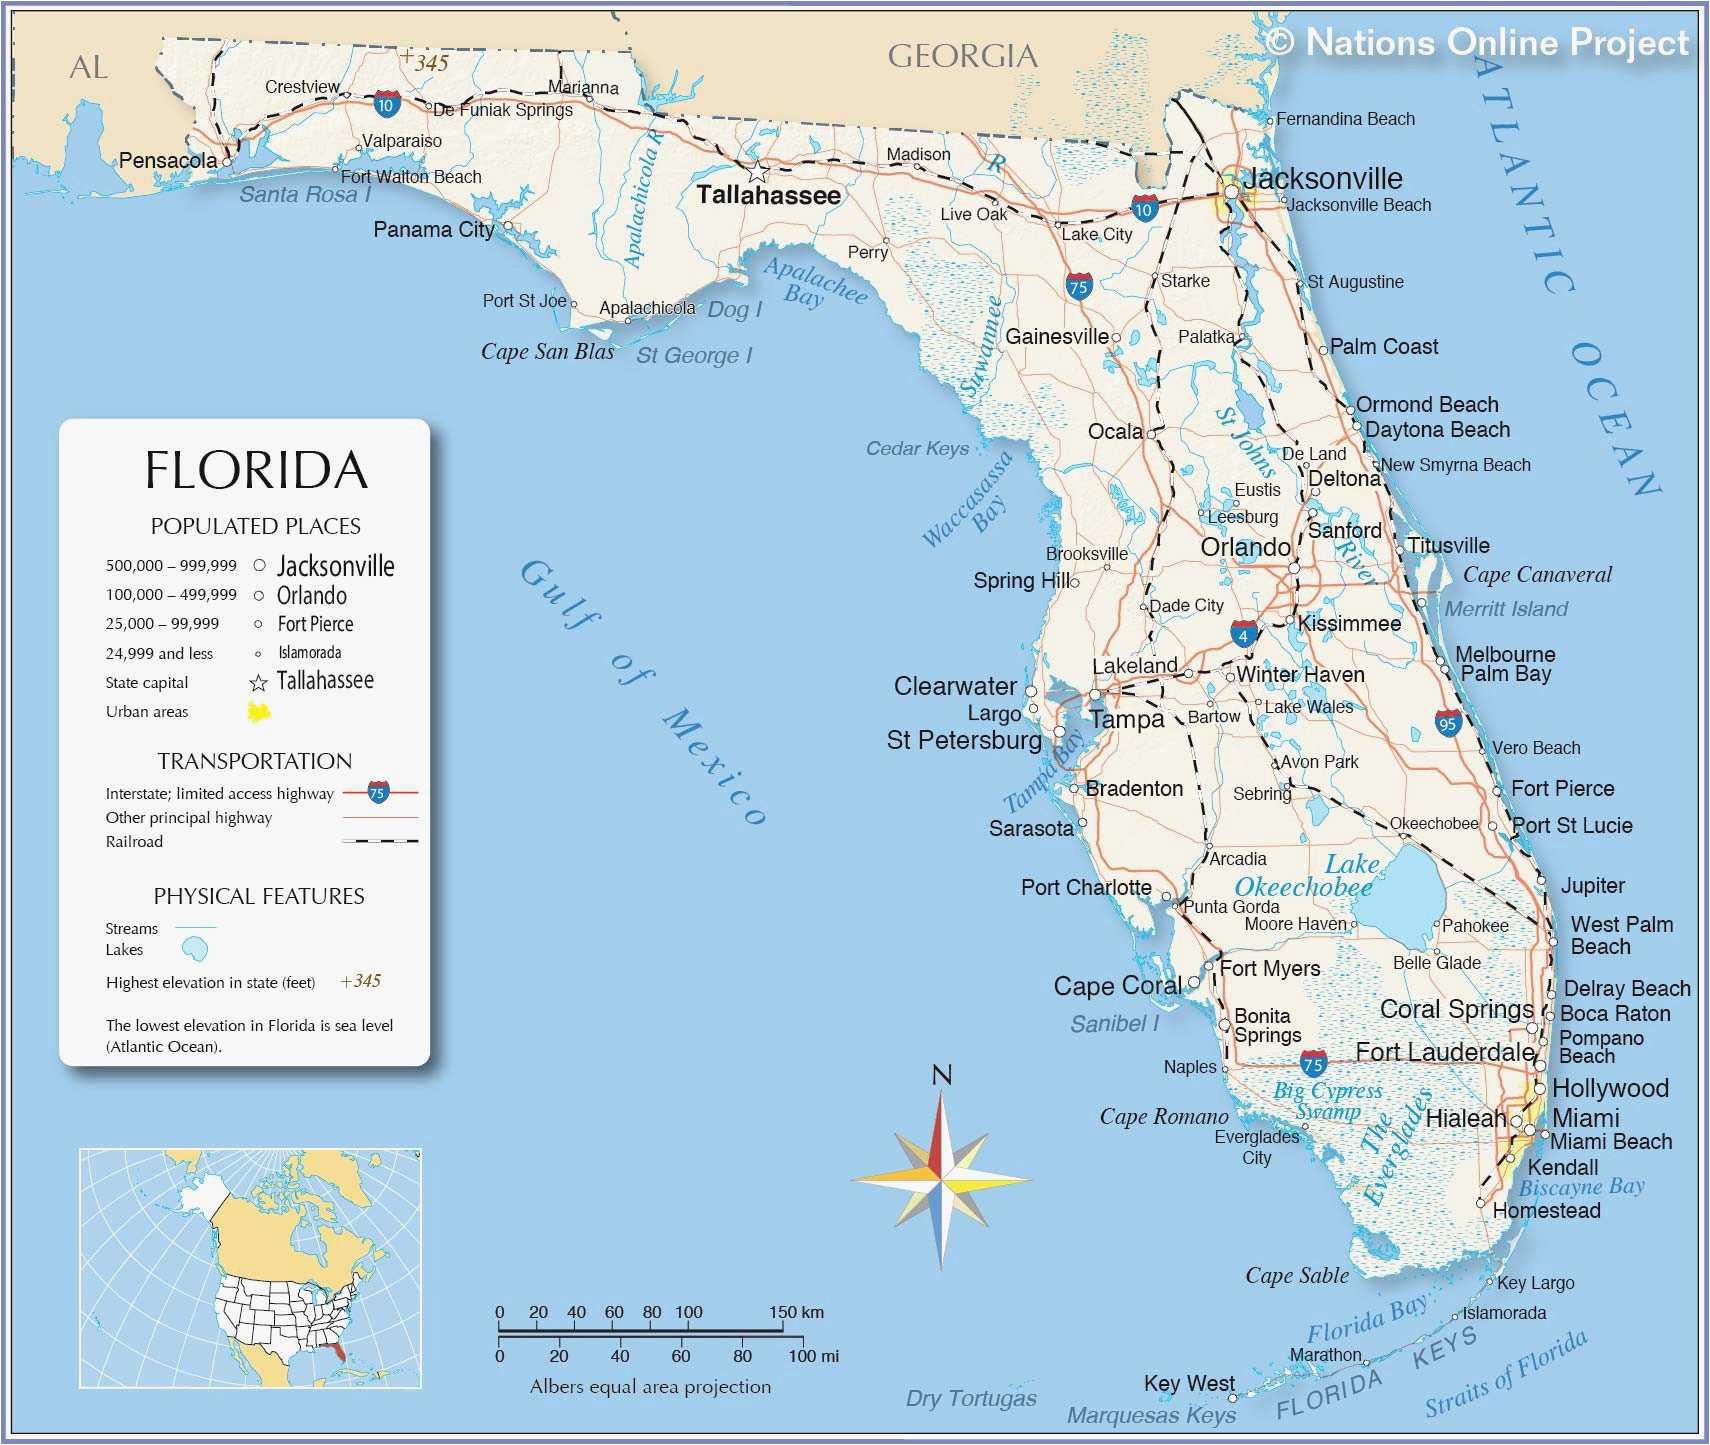 santa rosa island fl map, sanibel island florida beaches map, downtown santa rosa ca map, florida watercolor map, pass-a-grille fl map, walton county fl map, stuart fl map, st. george island fl map, choctawhatchee bay fl map, topsail preserve state park florida map, lake lorraine fl map, florida sawgrass mills mall map, lehigh acres florida zip code map, seminole county florida highway map, fort myers fl map, calhoun co fl map, santa rosa area map, captiva island fl map, youngstown fl map, nashville fl map, on santa rosa beach fl map